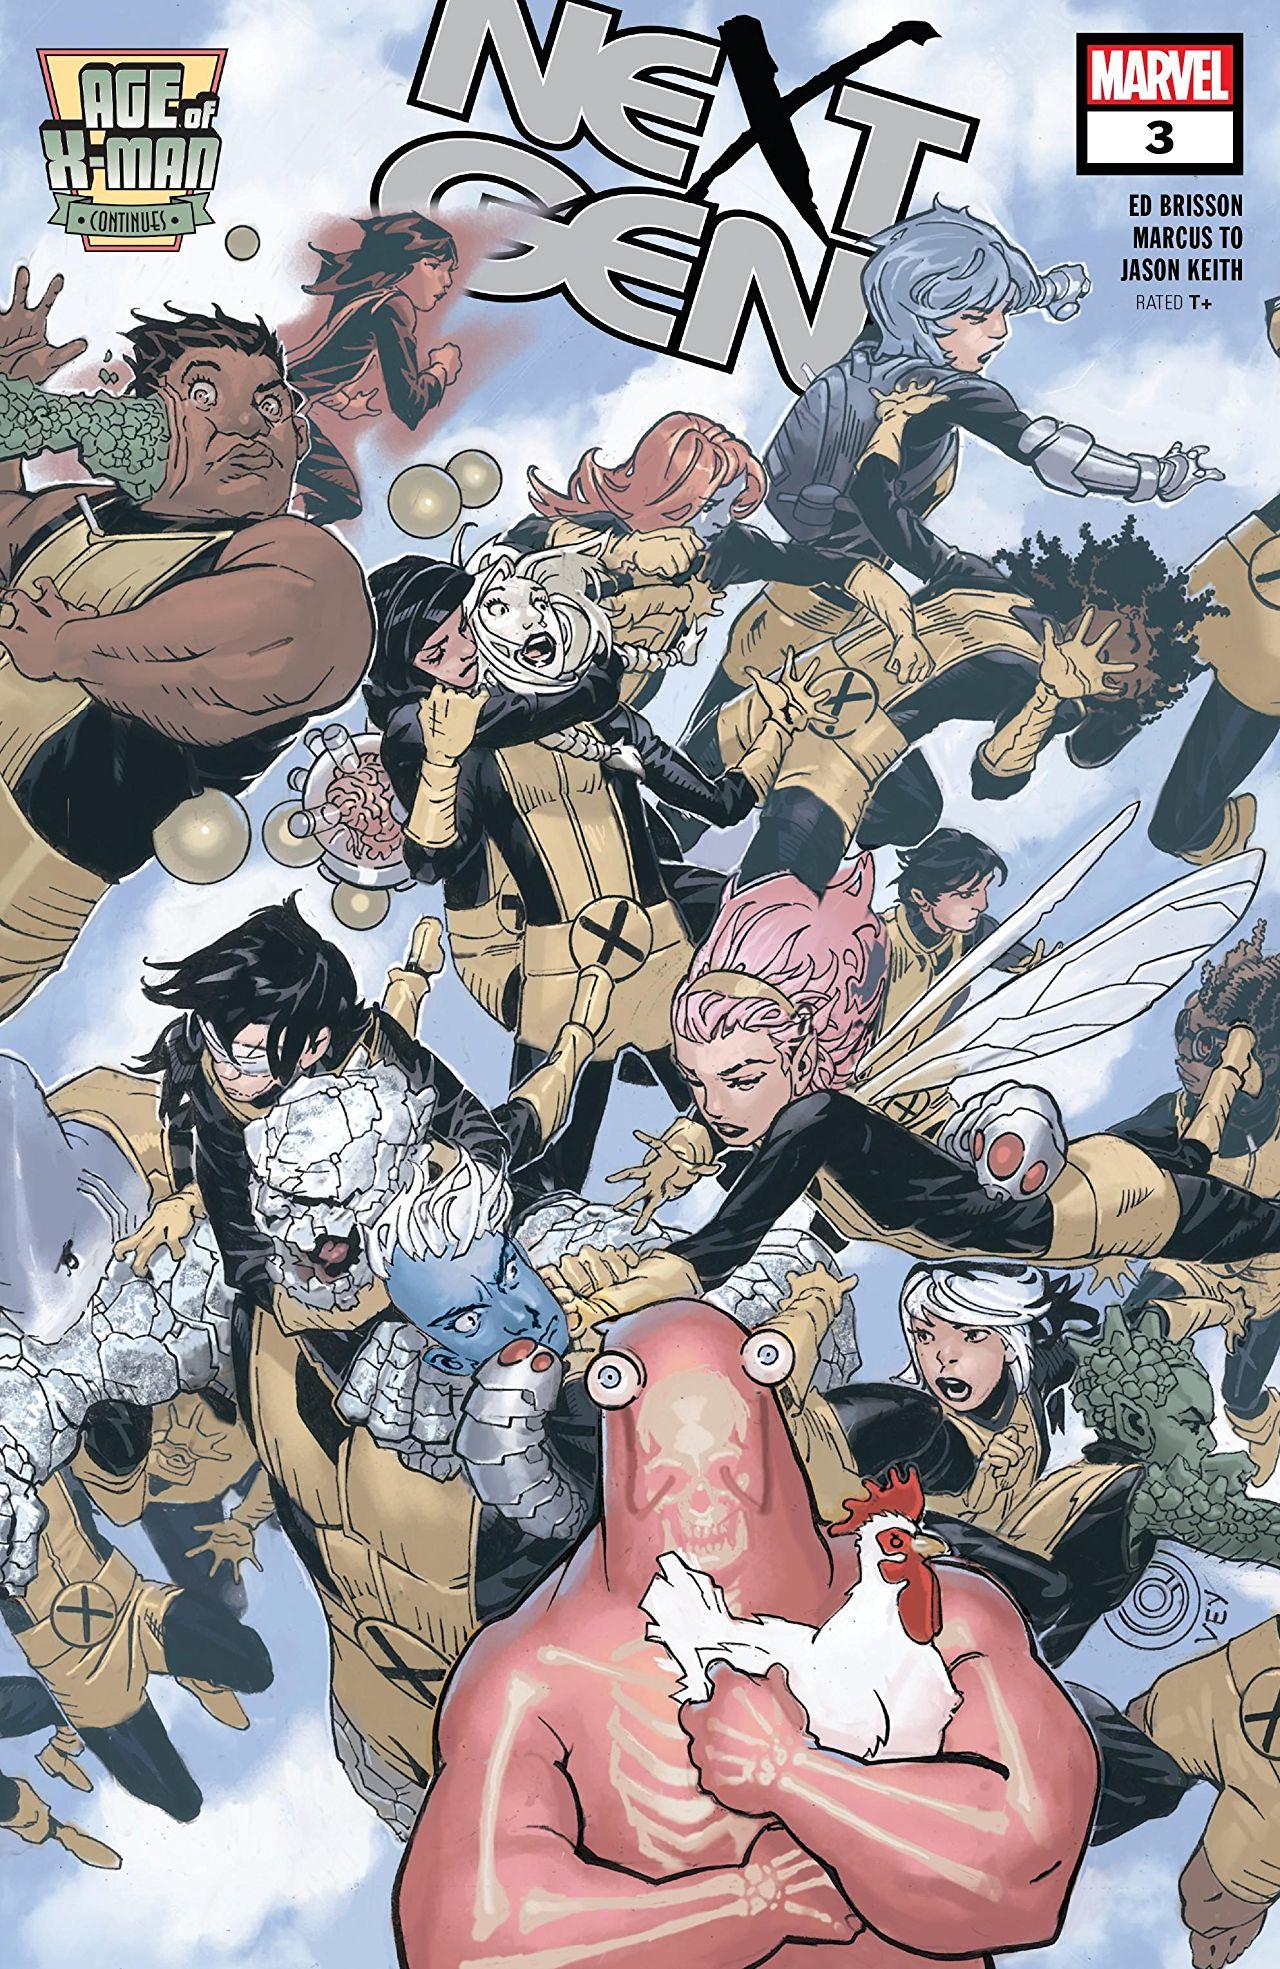 Age of X-Man: NextGen #3 cover